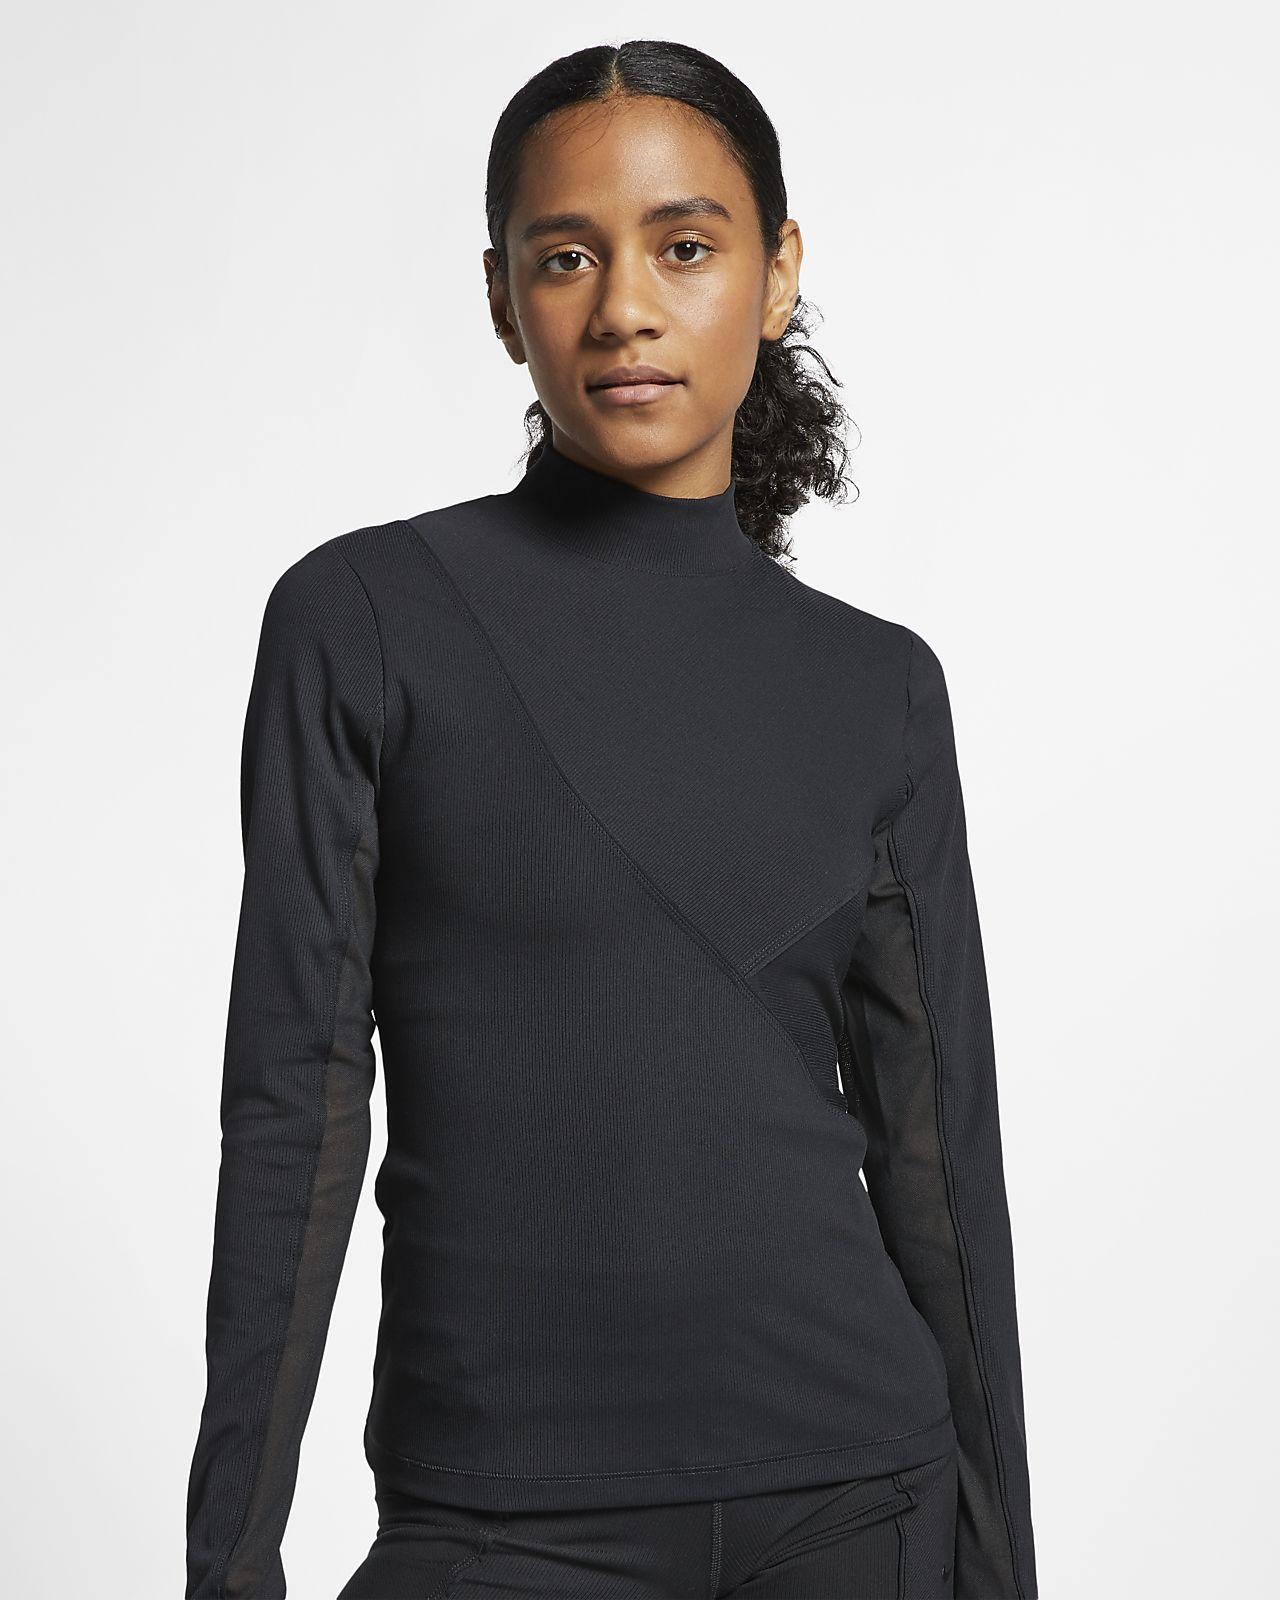 Nike Pro HyperCool geripptes Langarm-Oberteil für Damen